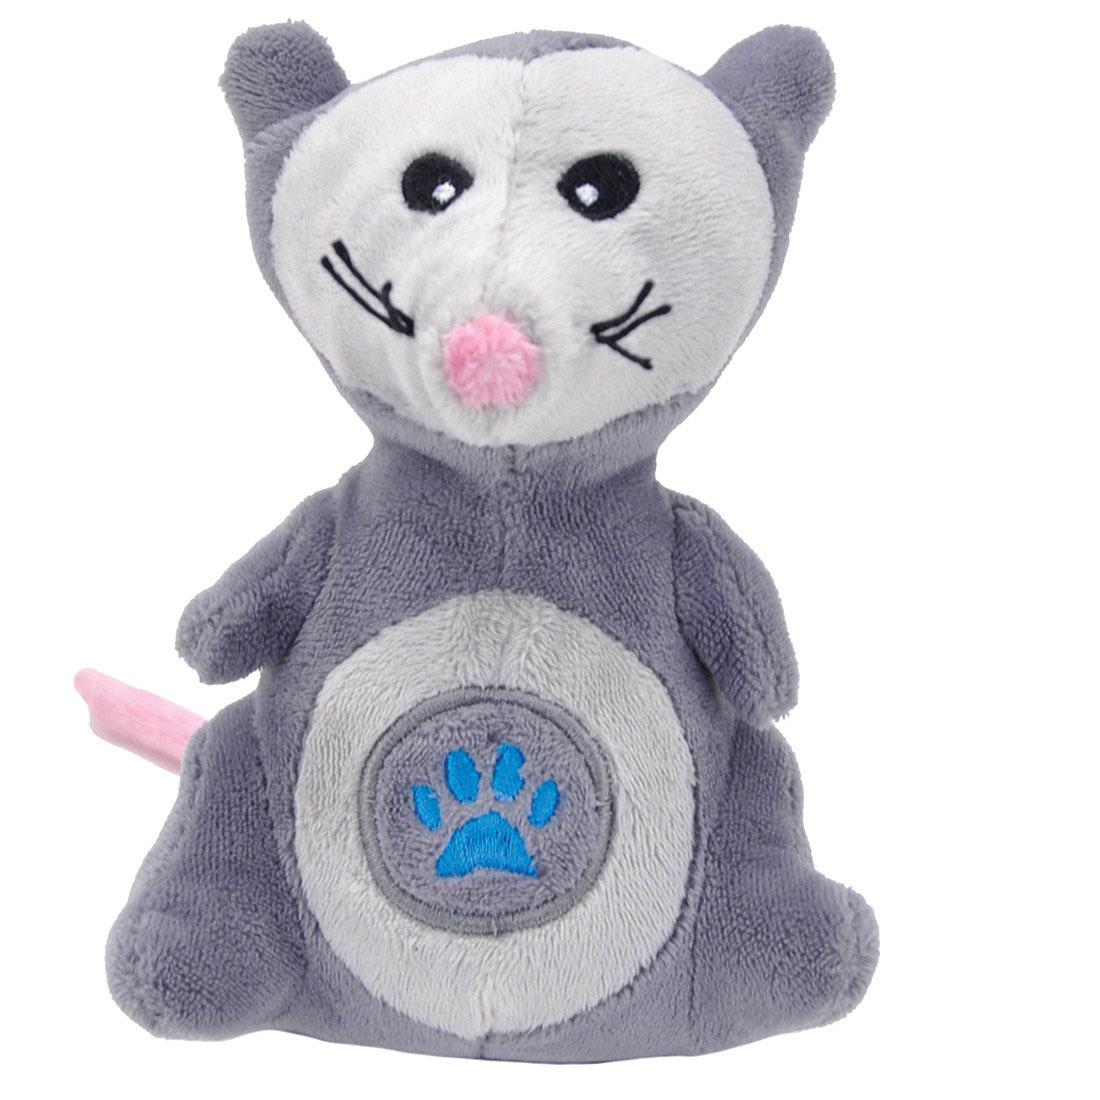 Li'l Pals Paw Opossum Plush Dog Toy, 5-in